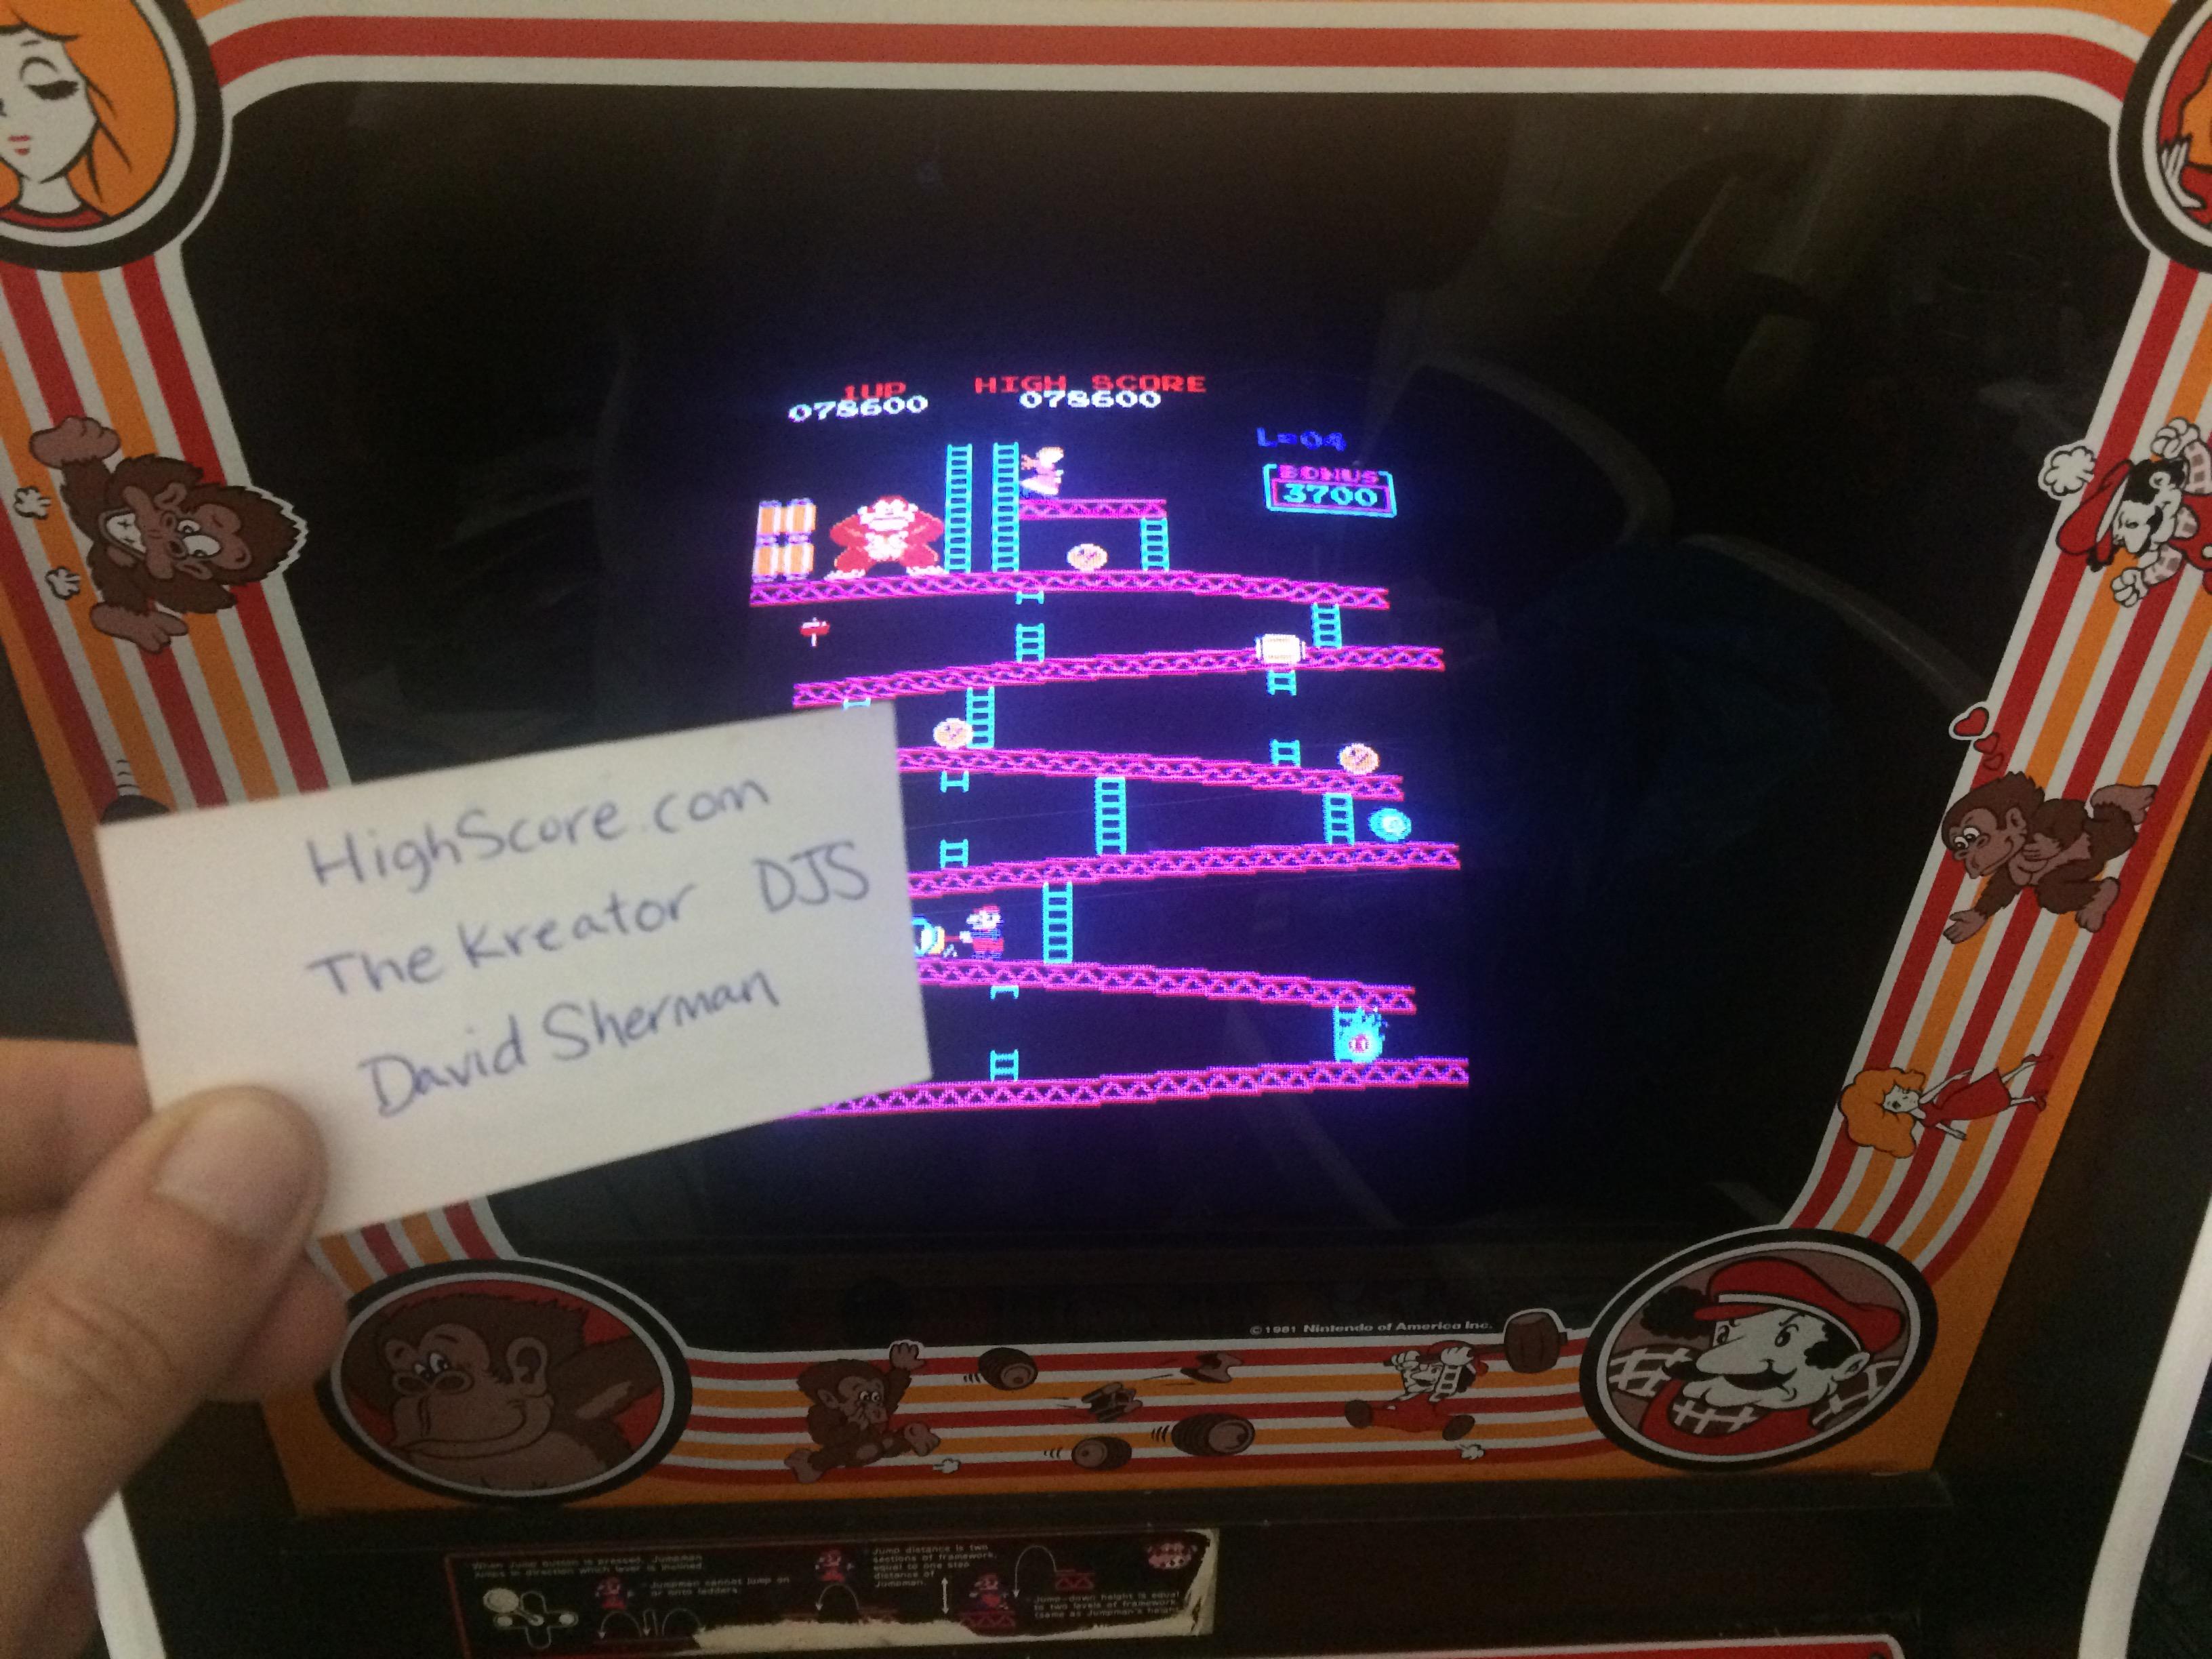 thekreator: Donkey Kong (Arcade) 78,600 points on 2017-06-10 04:39:34